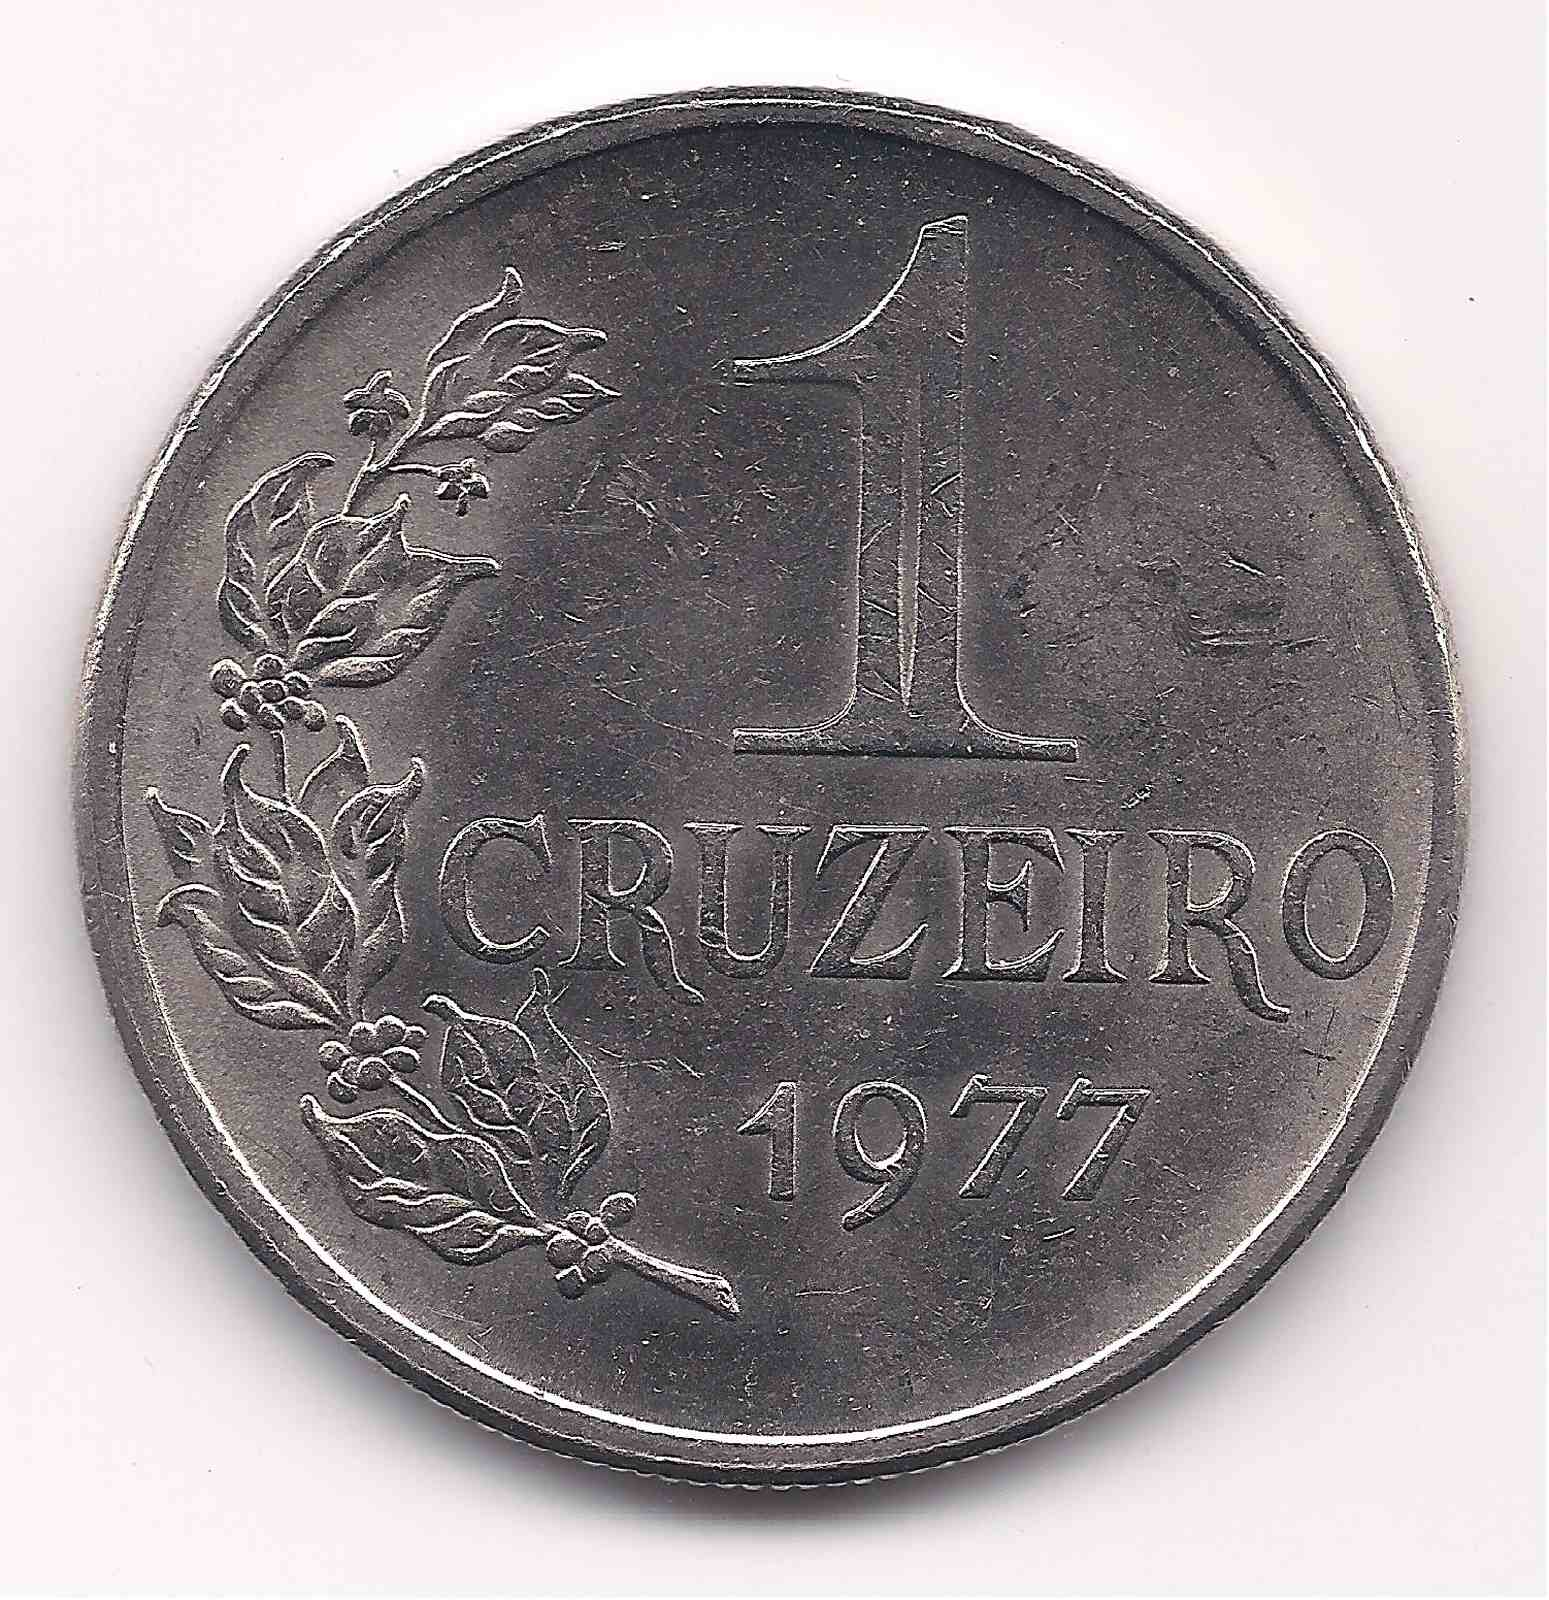 1 Cruzeiro 1977 - Escassa